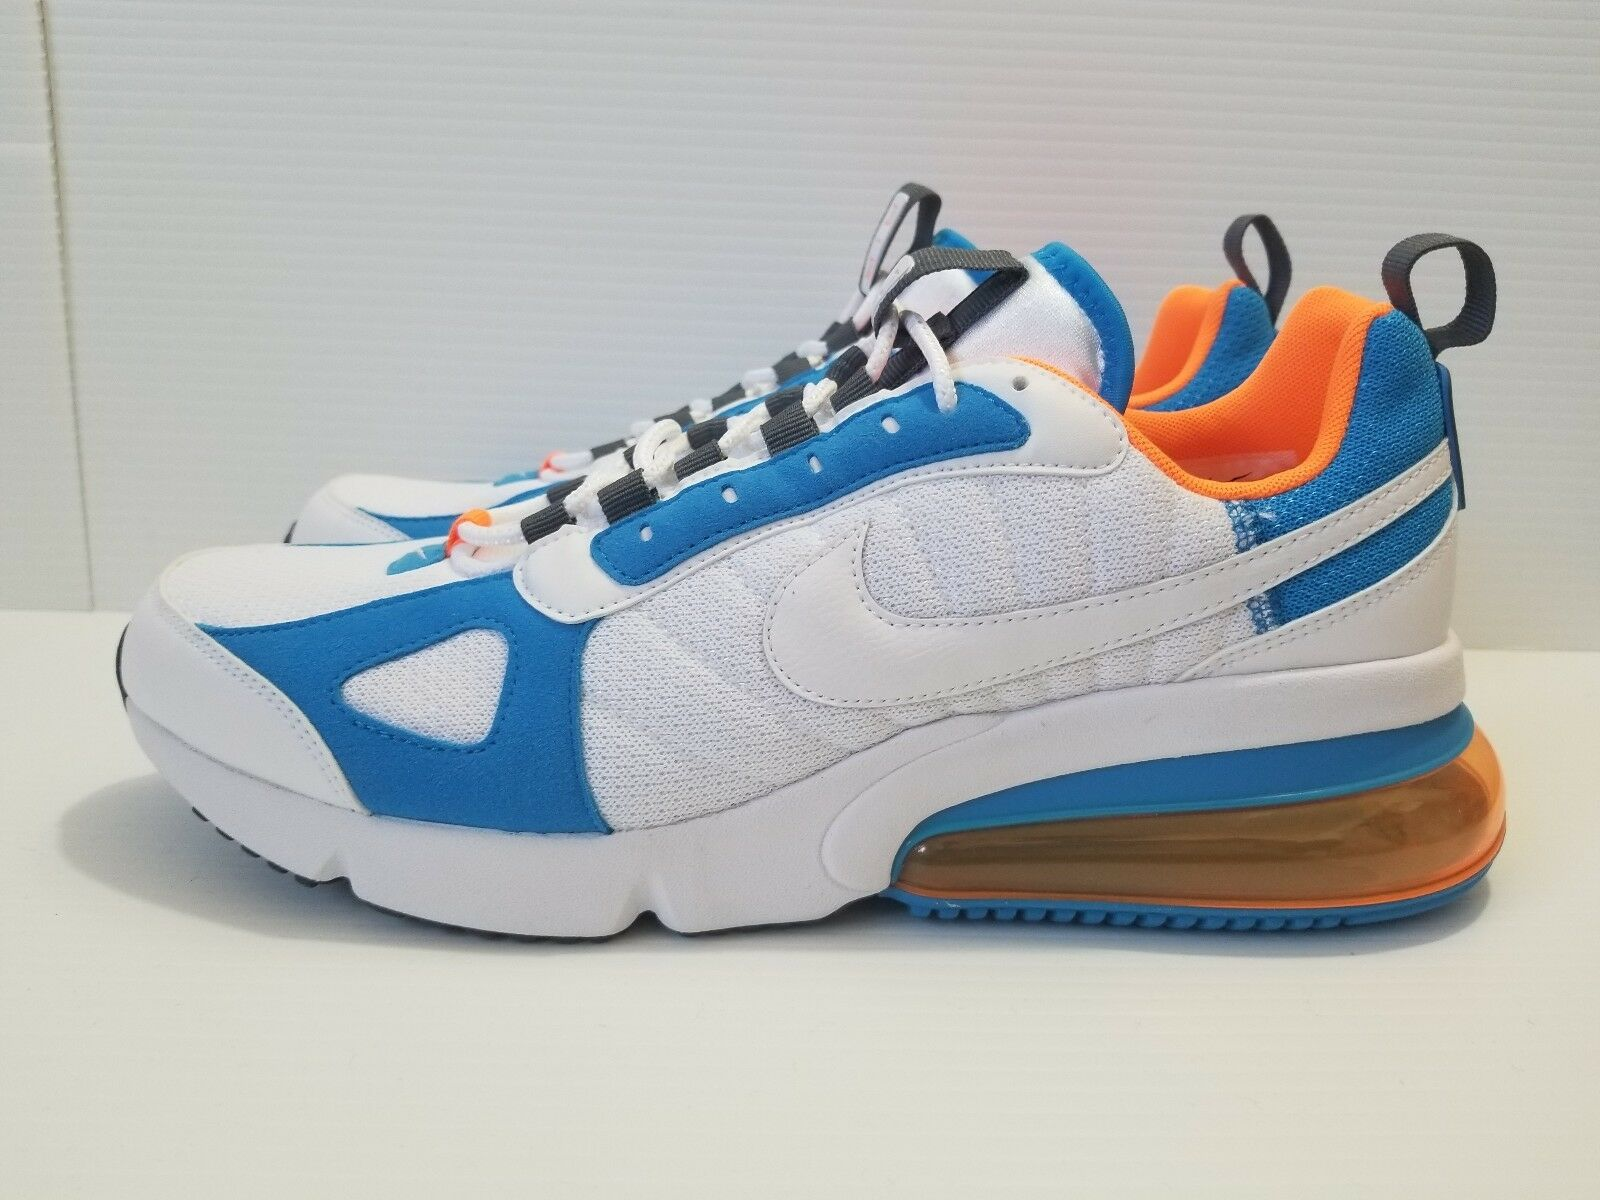 Nike Air Max 270 Futura White bluee orange Running Men shoes Sz 9.5 (AO1569 100)